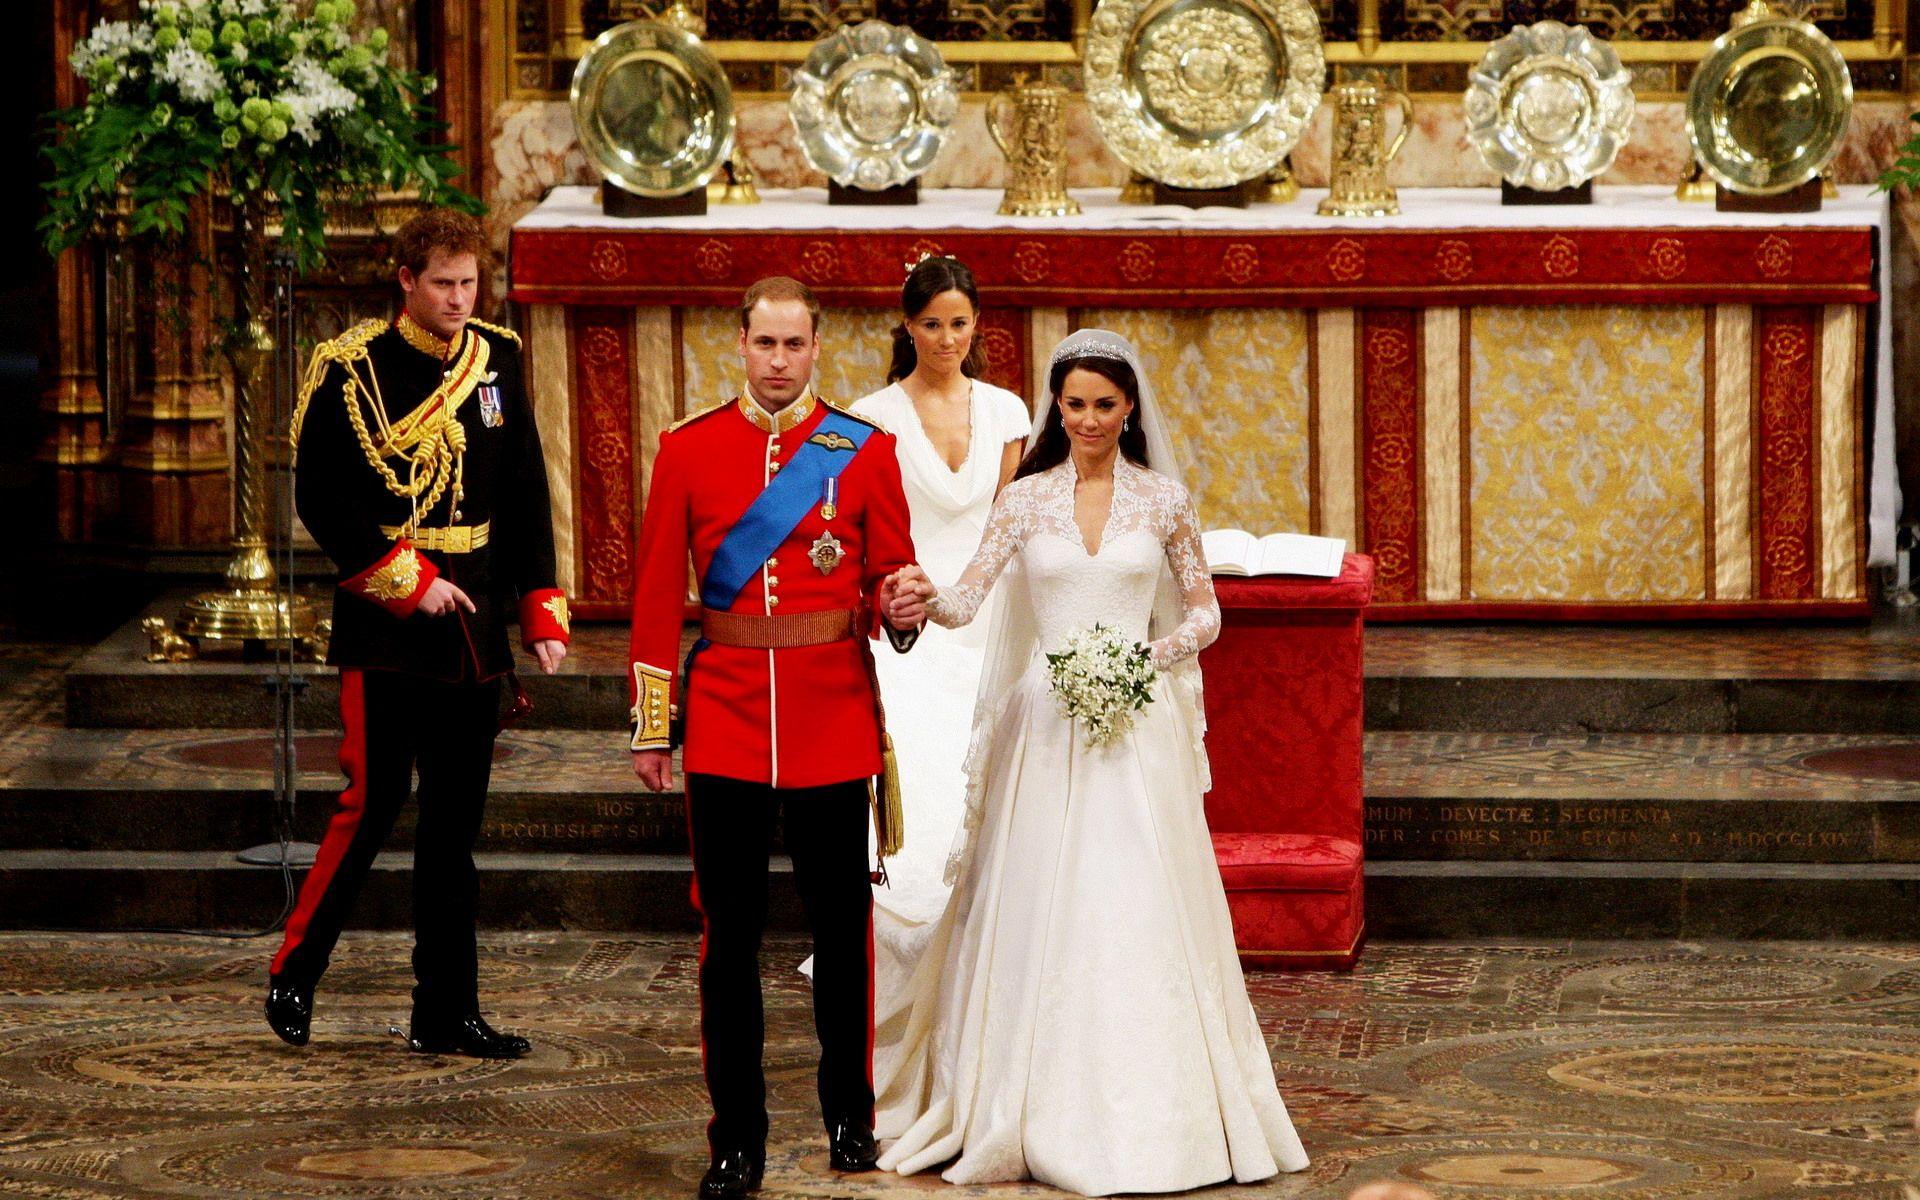 Prince William Wedding.Image Kate Middleton William Wedding Hd Wallpapers Royal